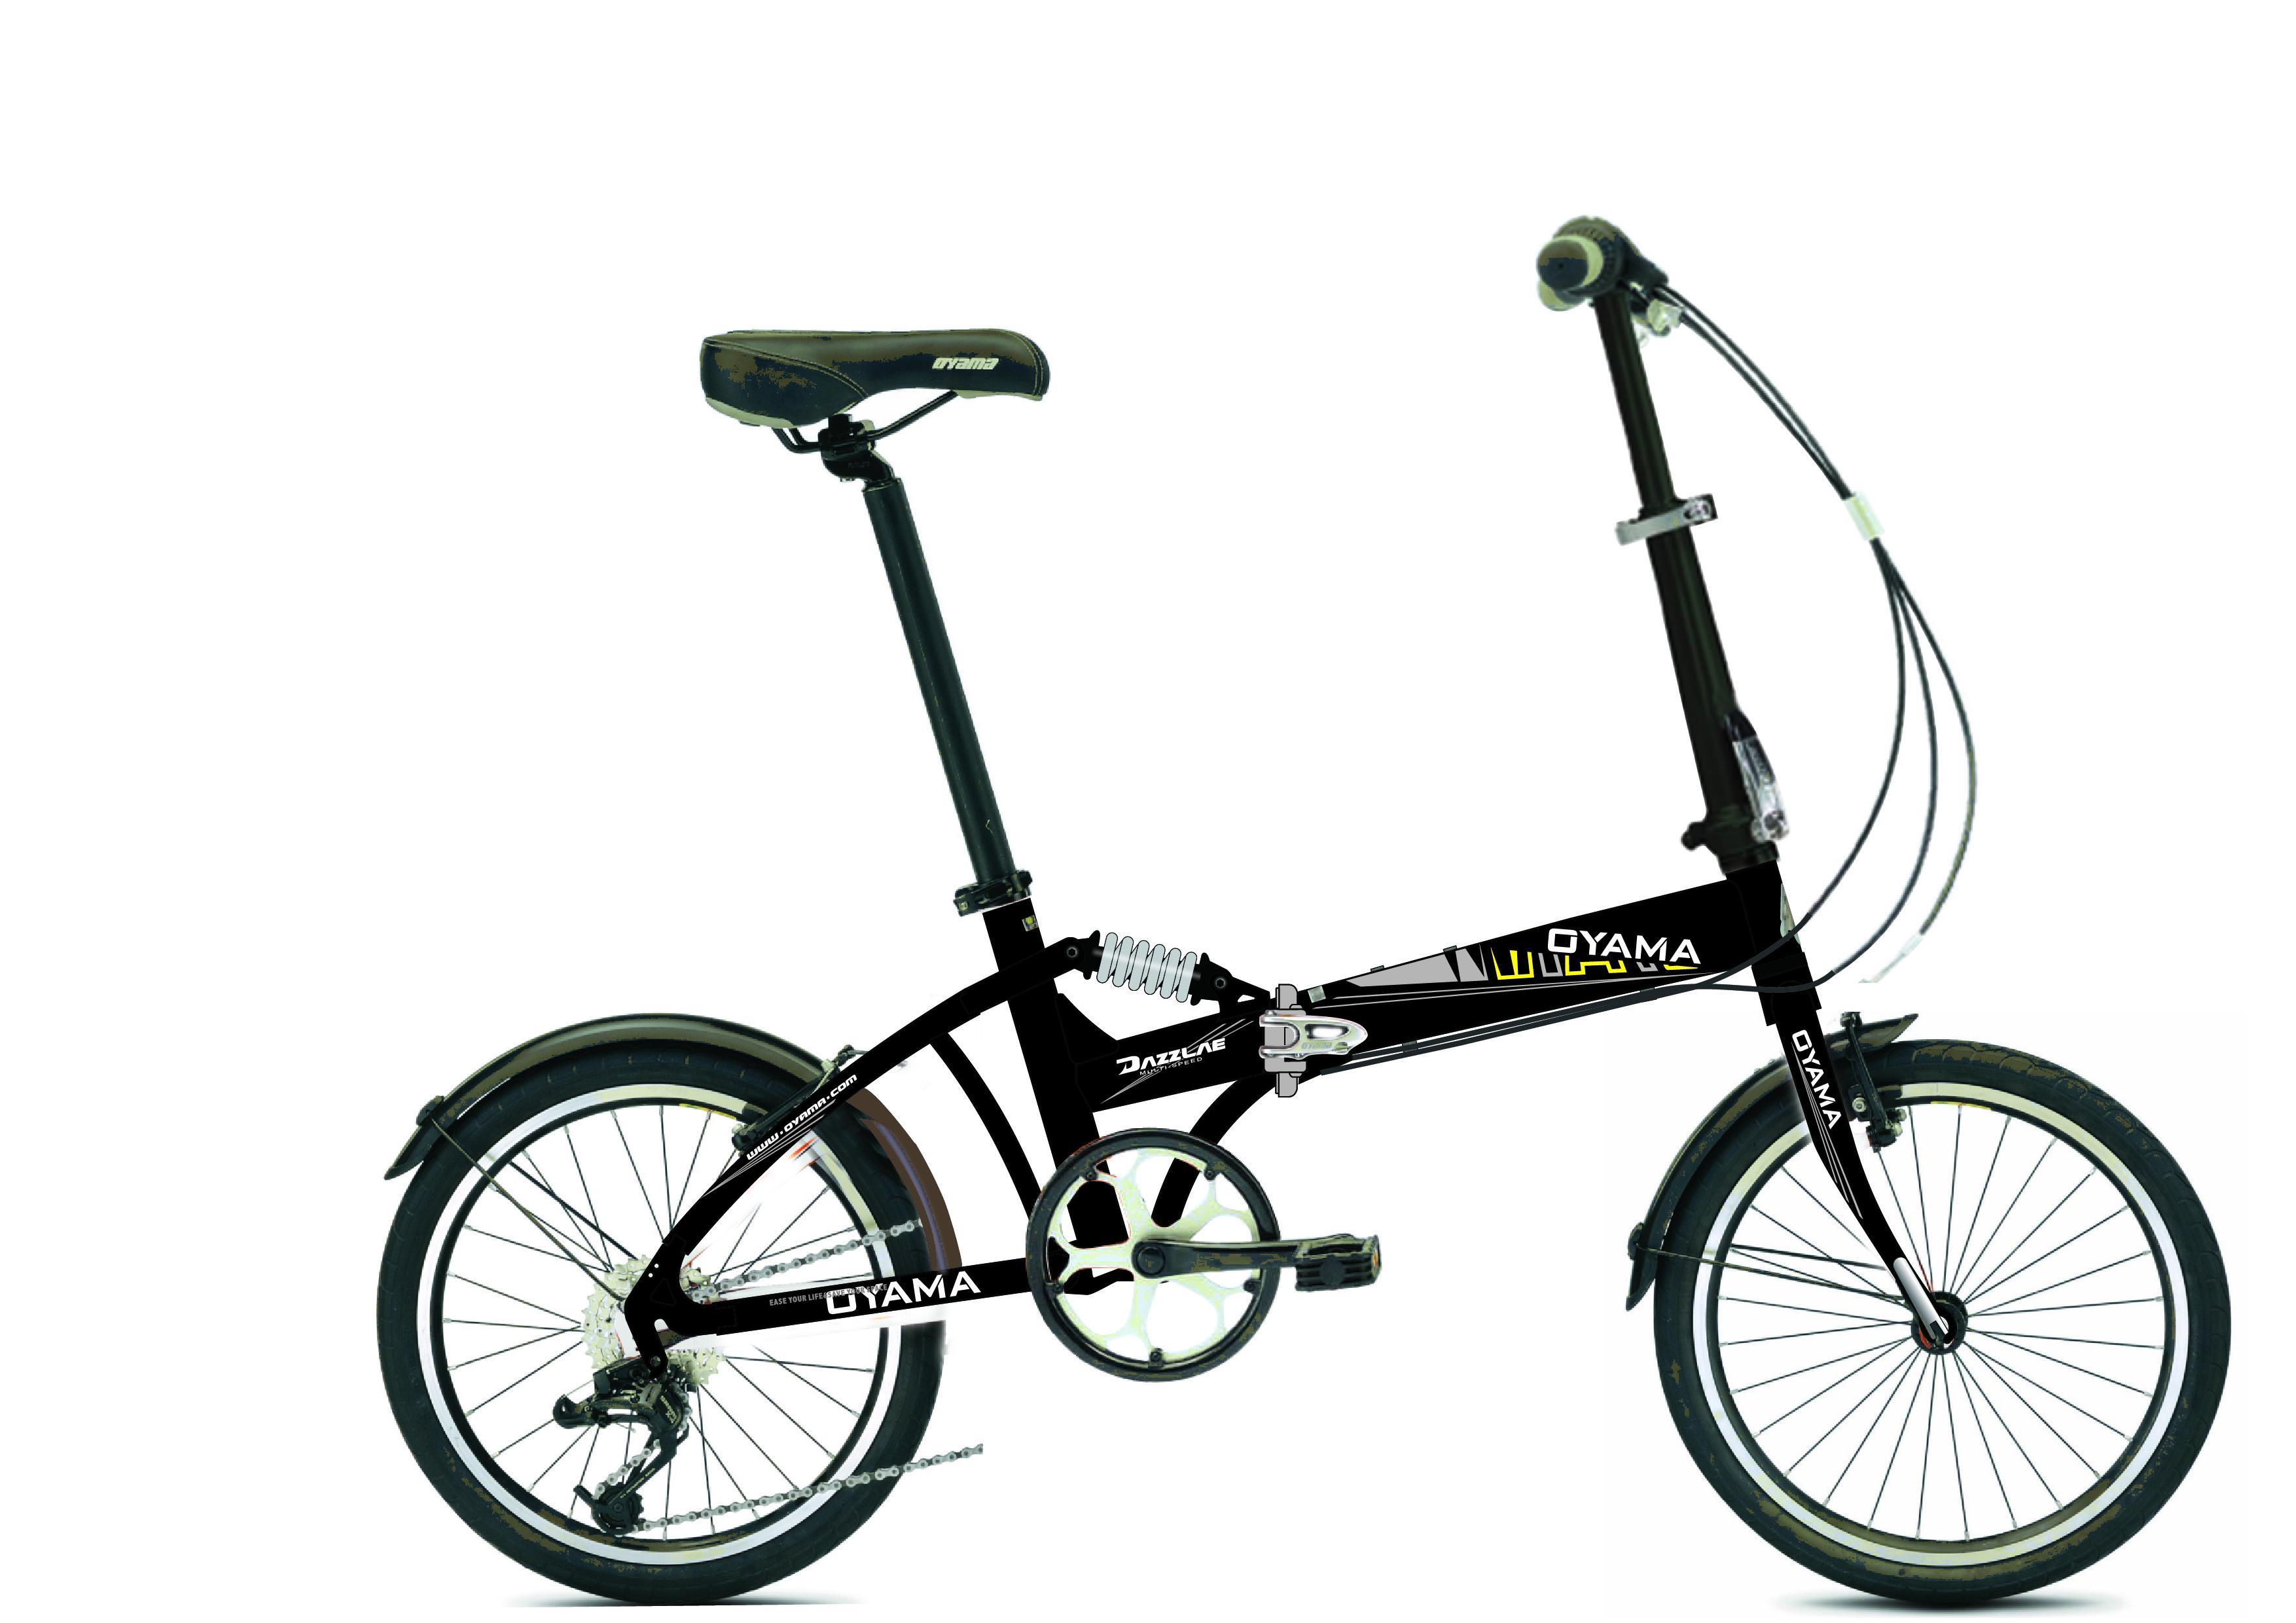 складной велосипед Oyama Cool/m500 M500 20 milldom m500 standart